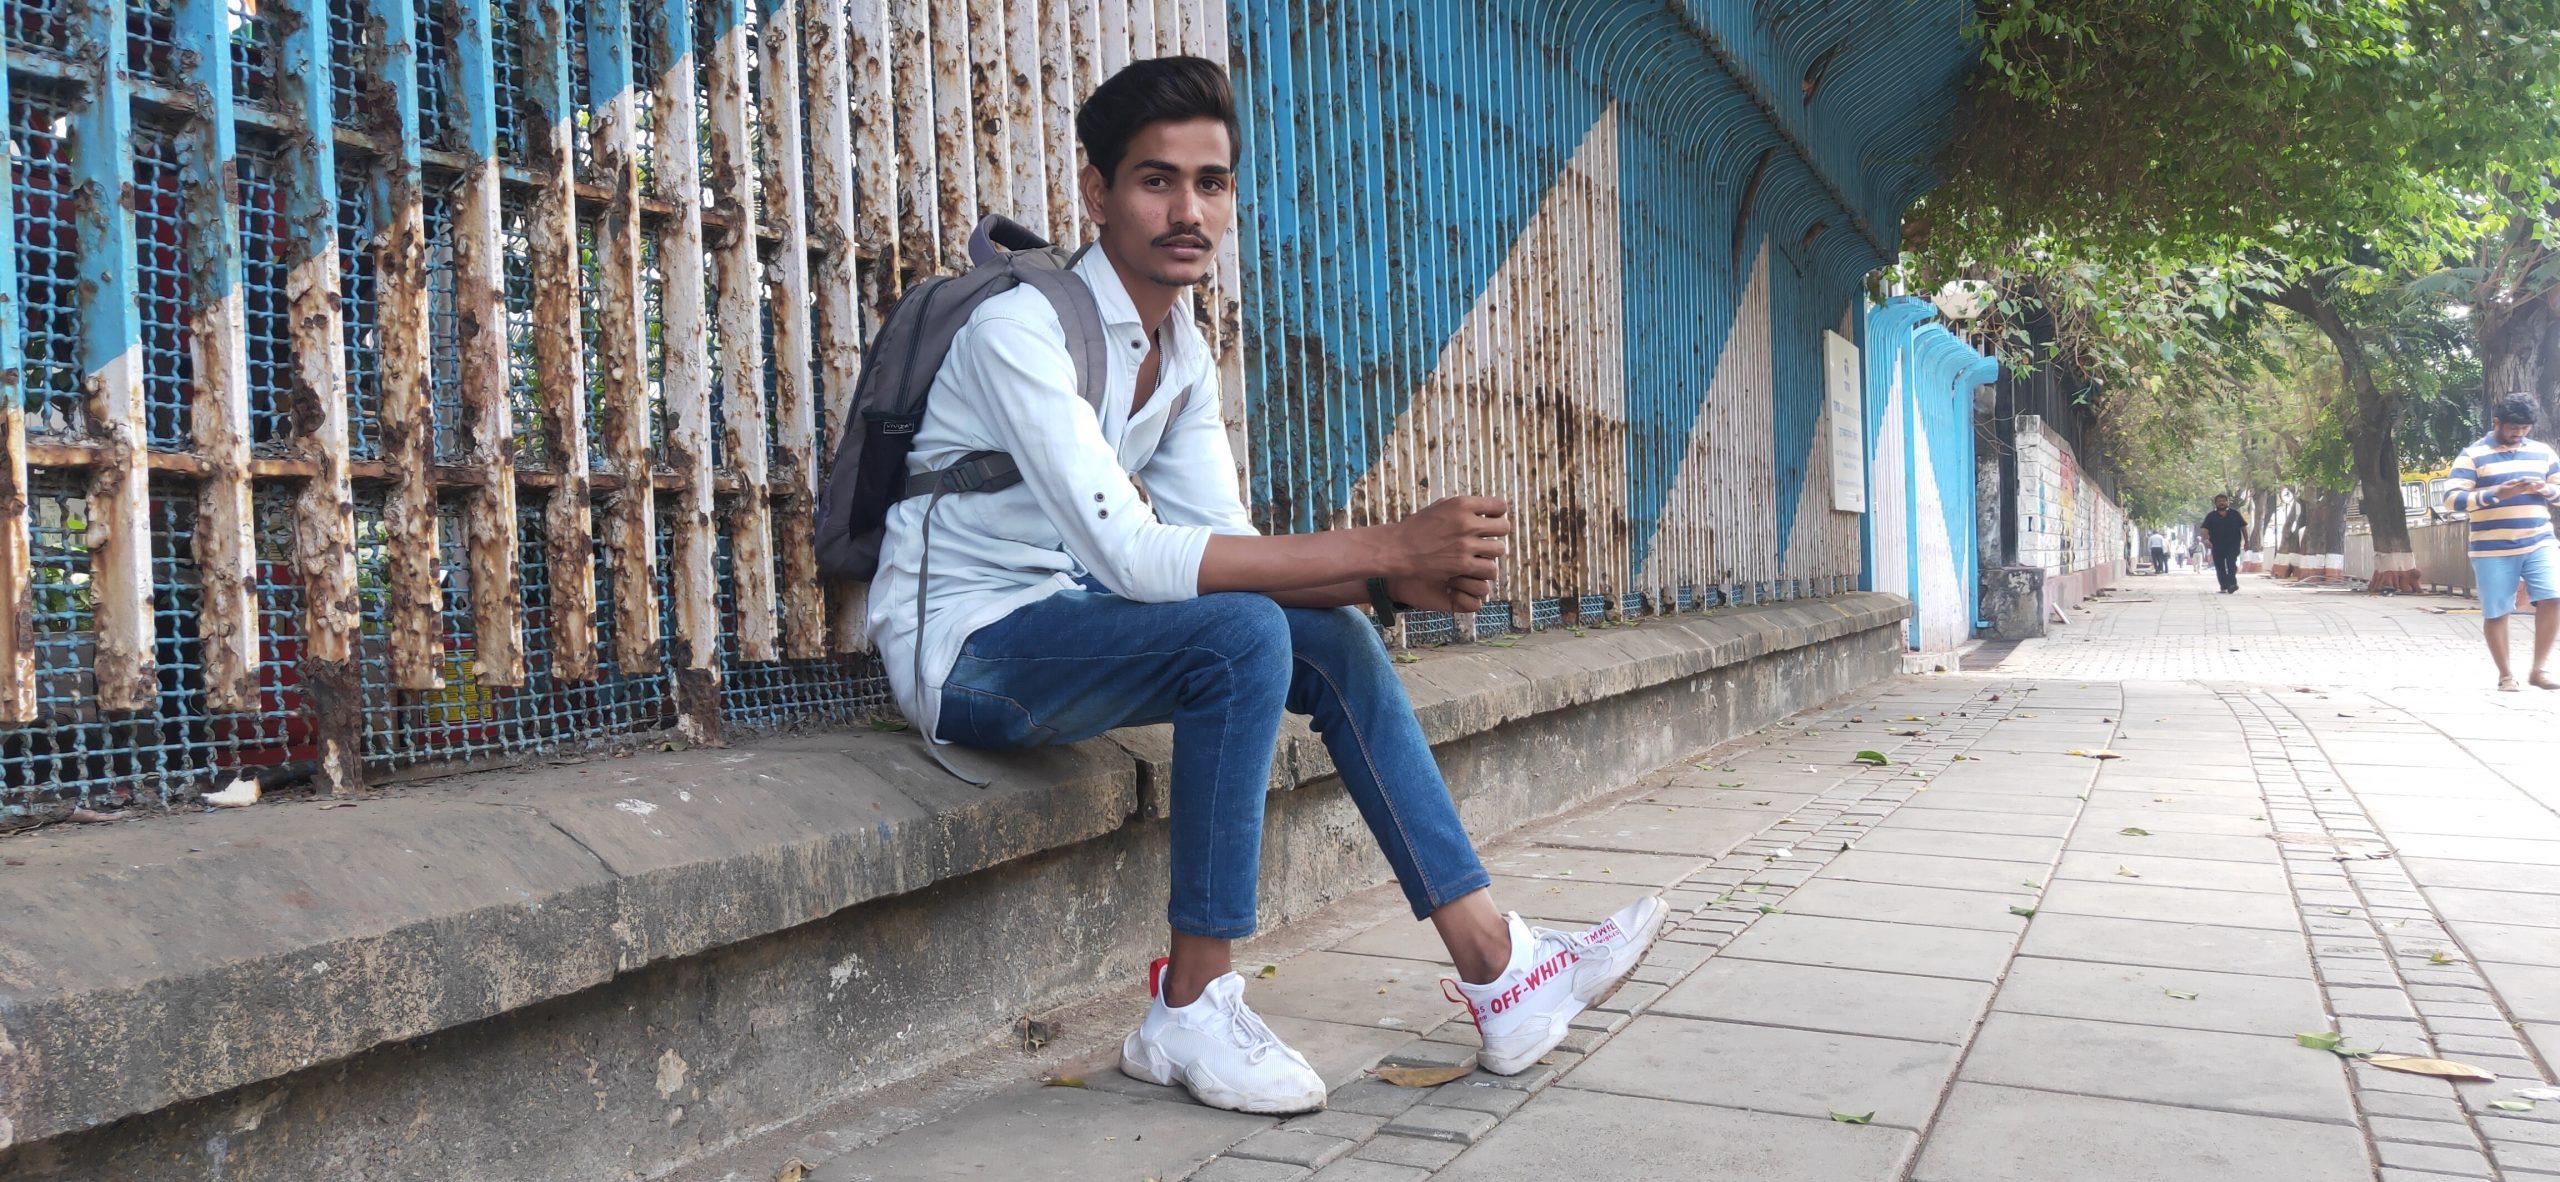 A boy in a city